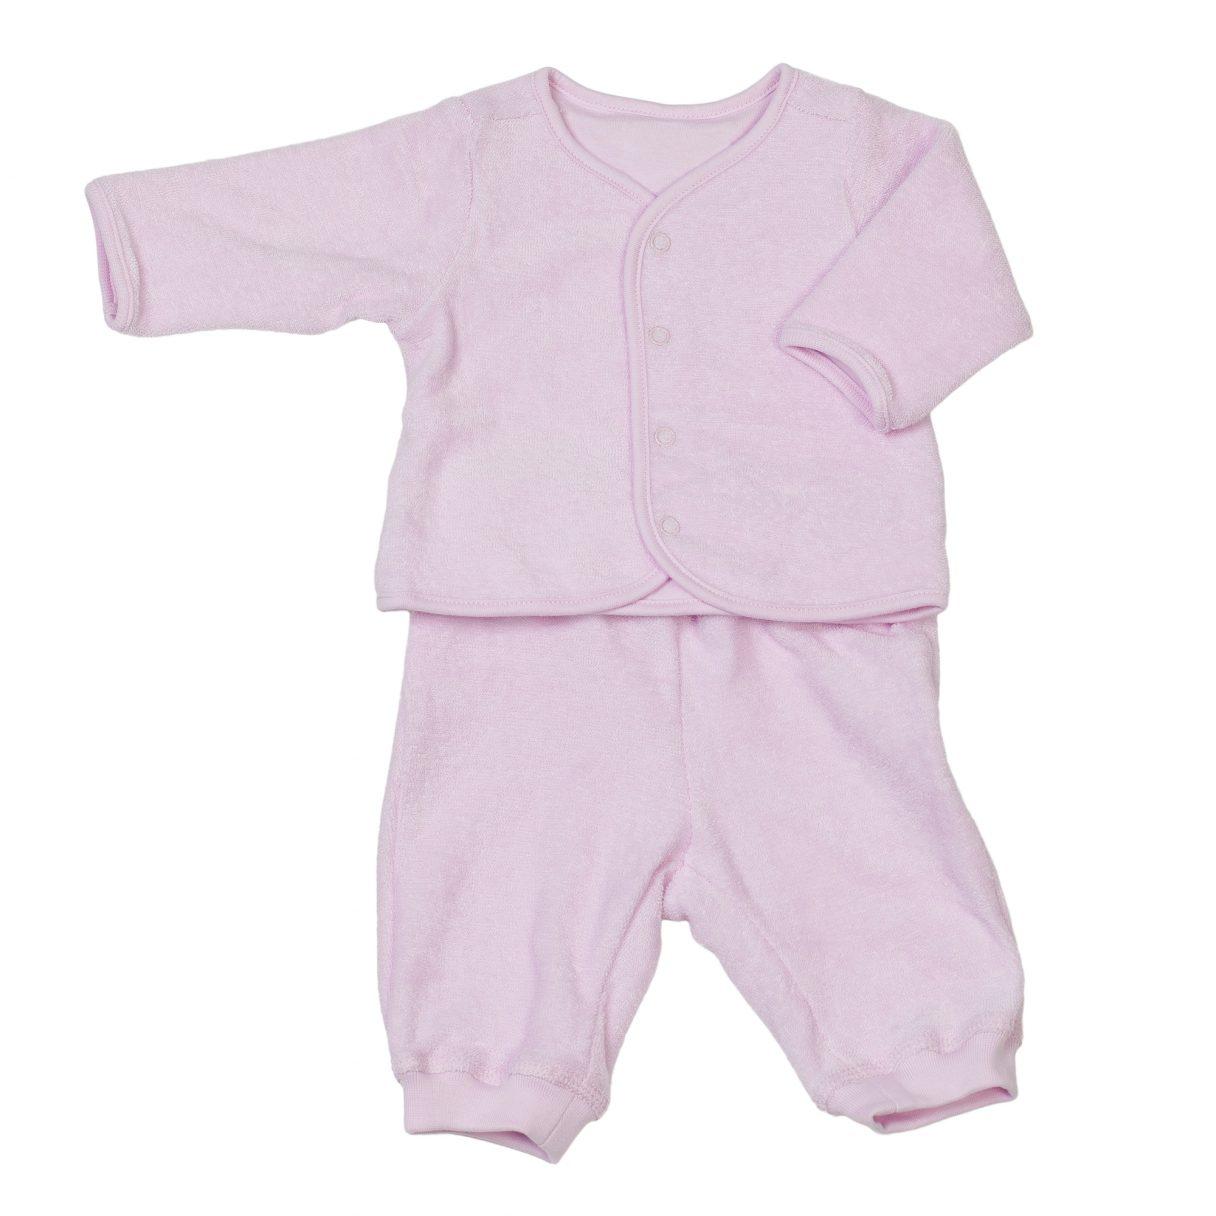 Baby Organic Cotton Sweatsuit Pink